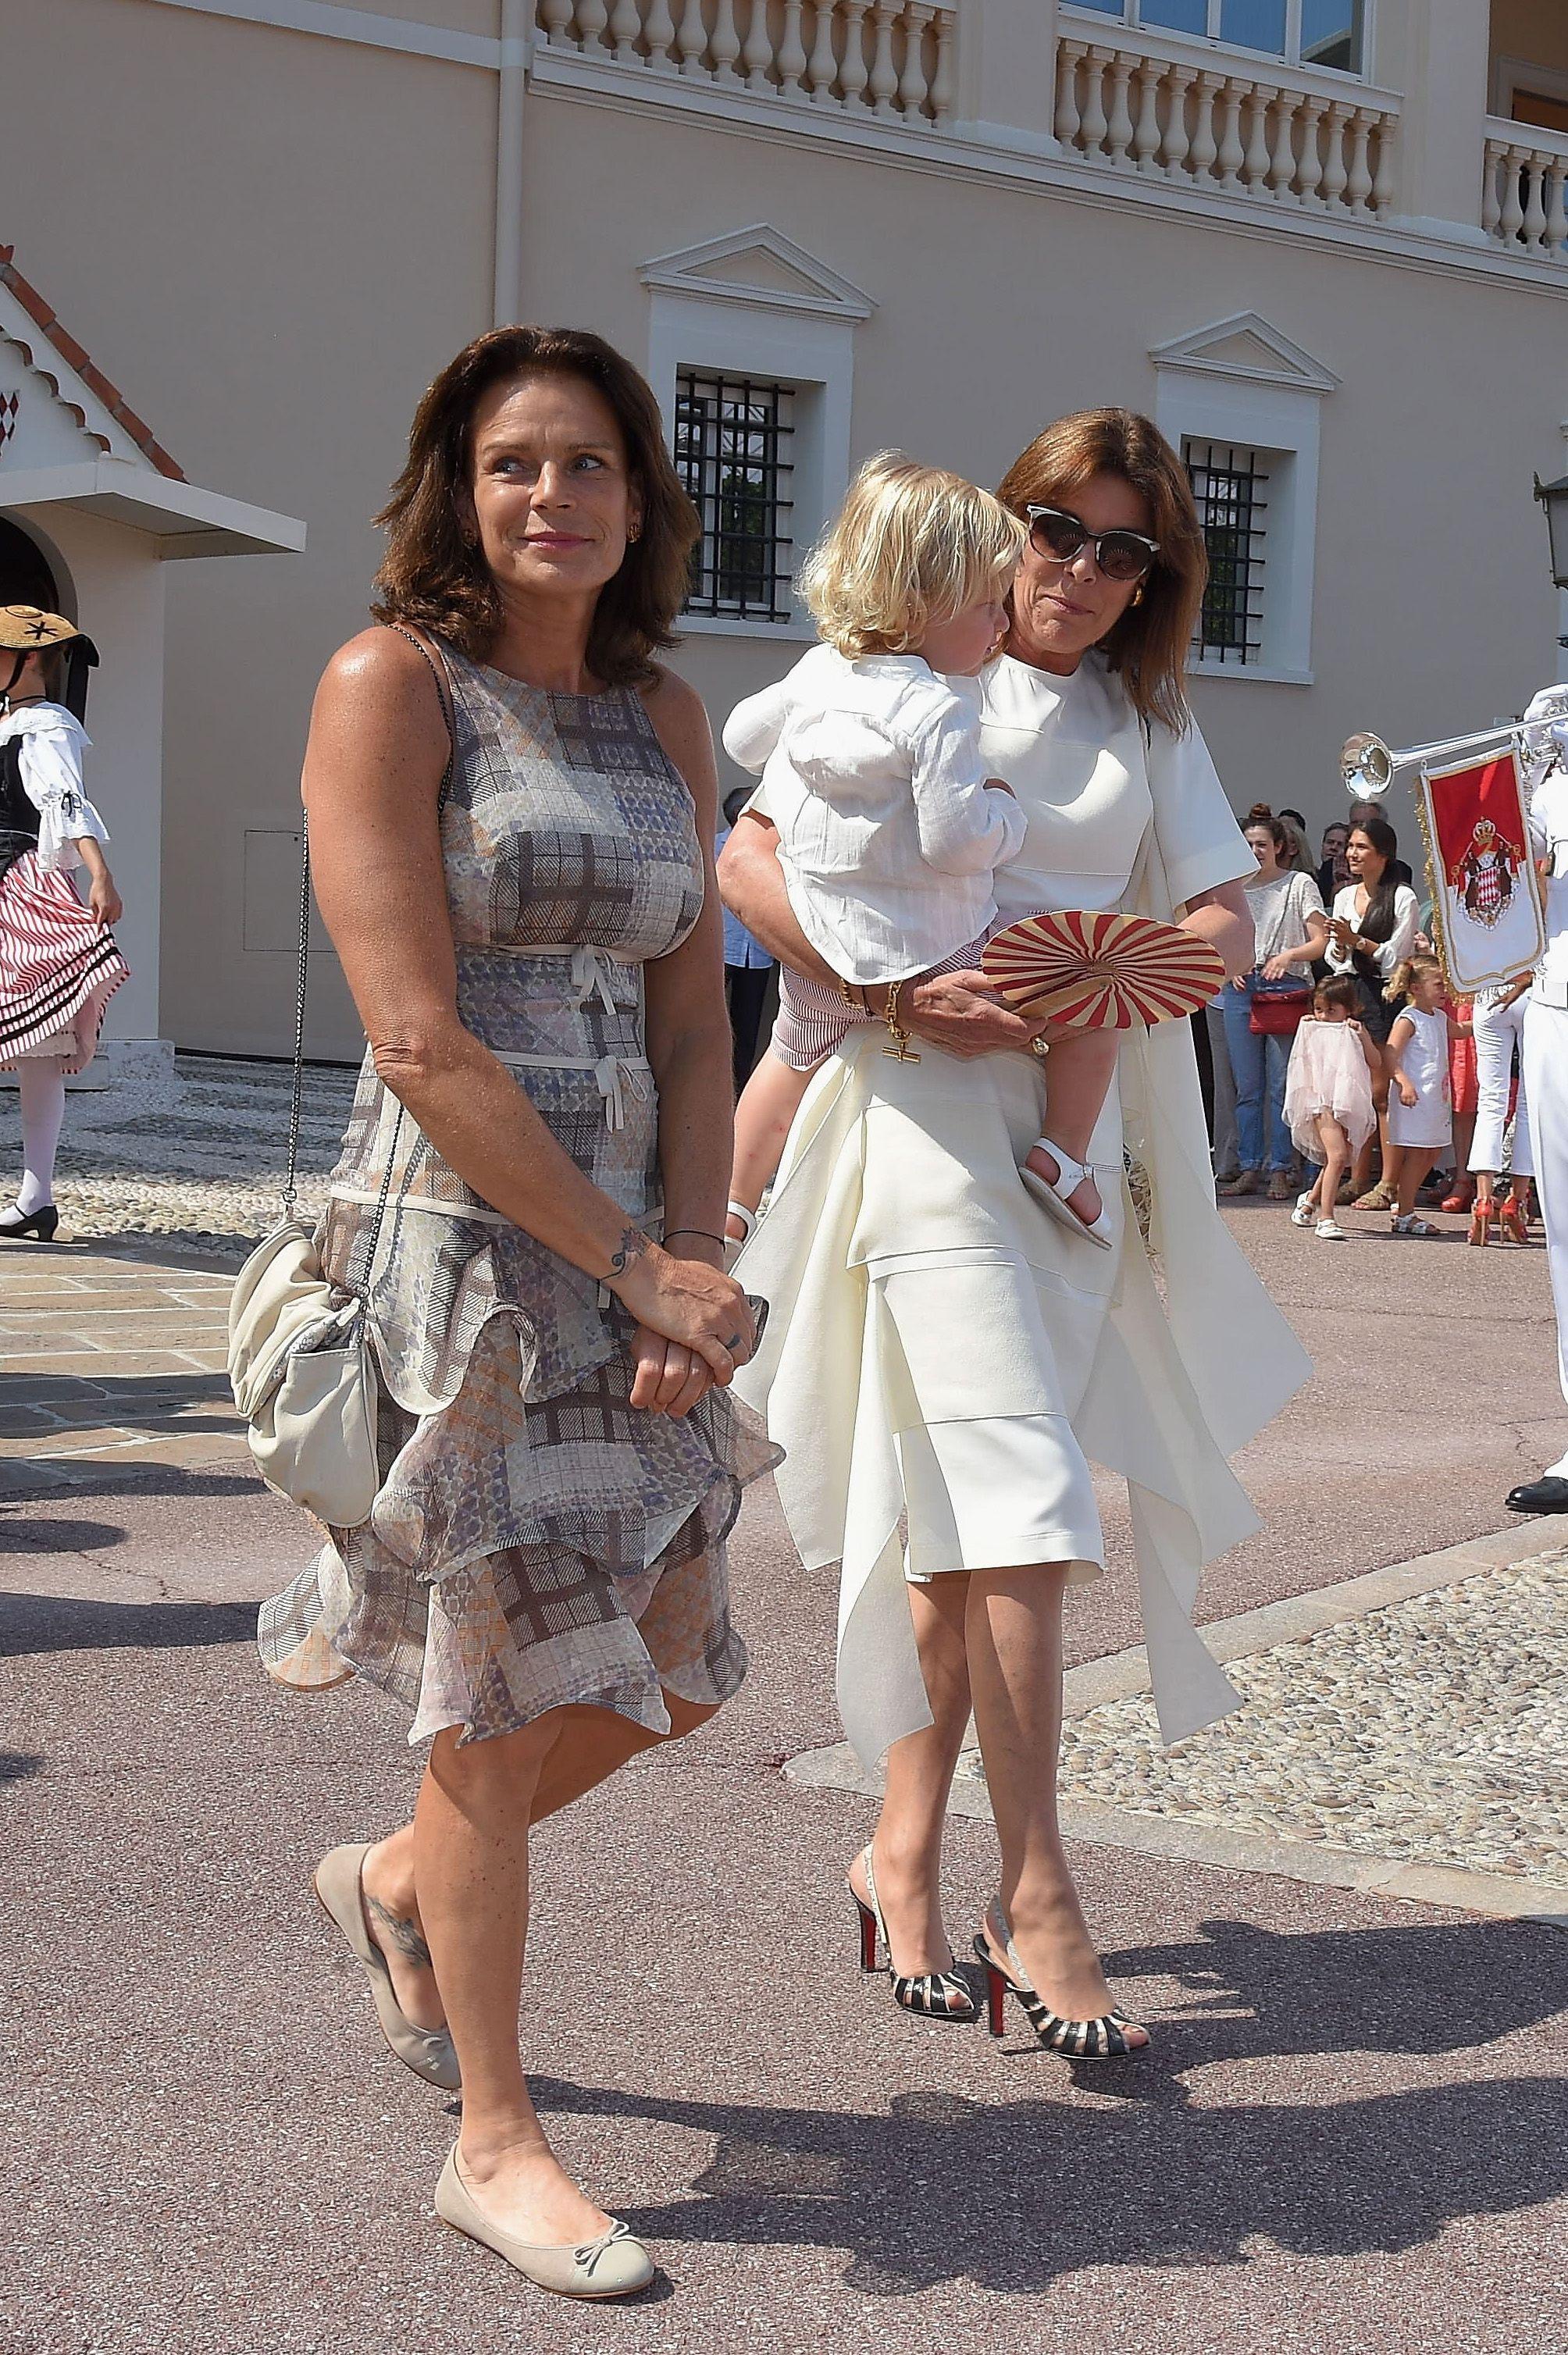 princesse-stephanie-of-monaco-and-princess-caroline-of-news-photo-1580163446.jpg